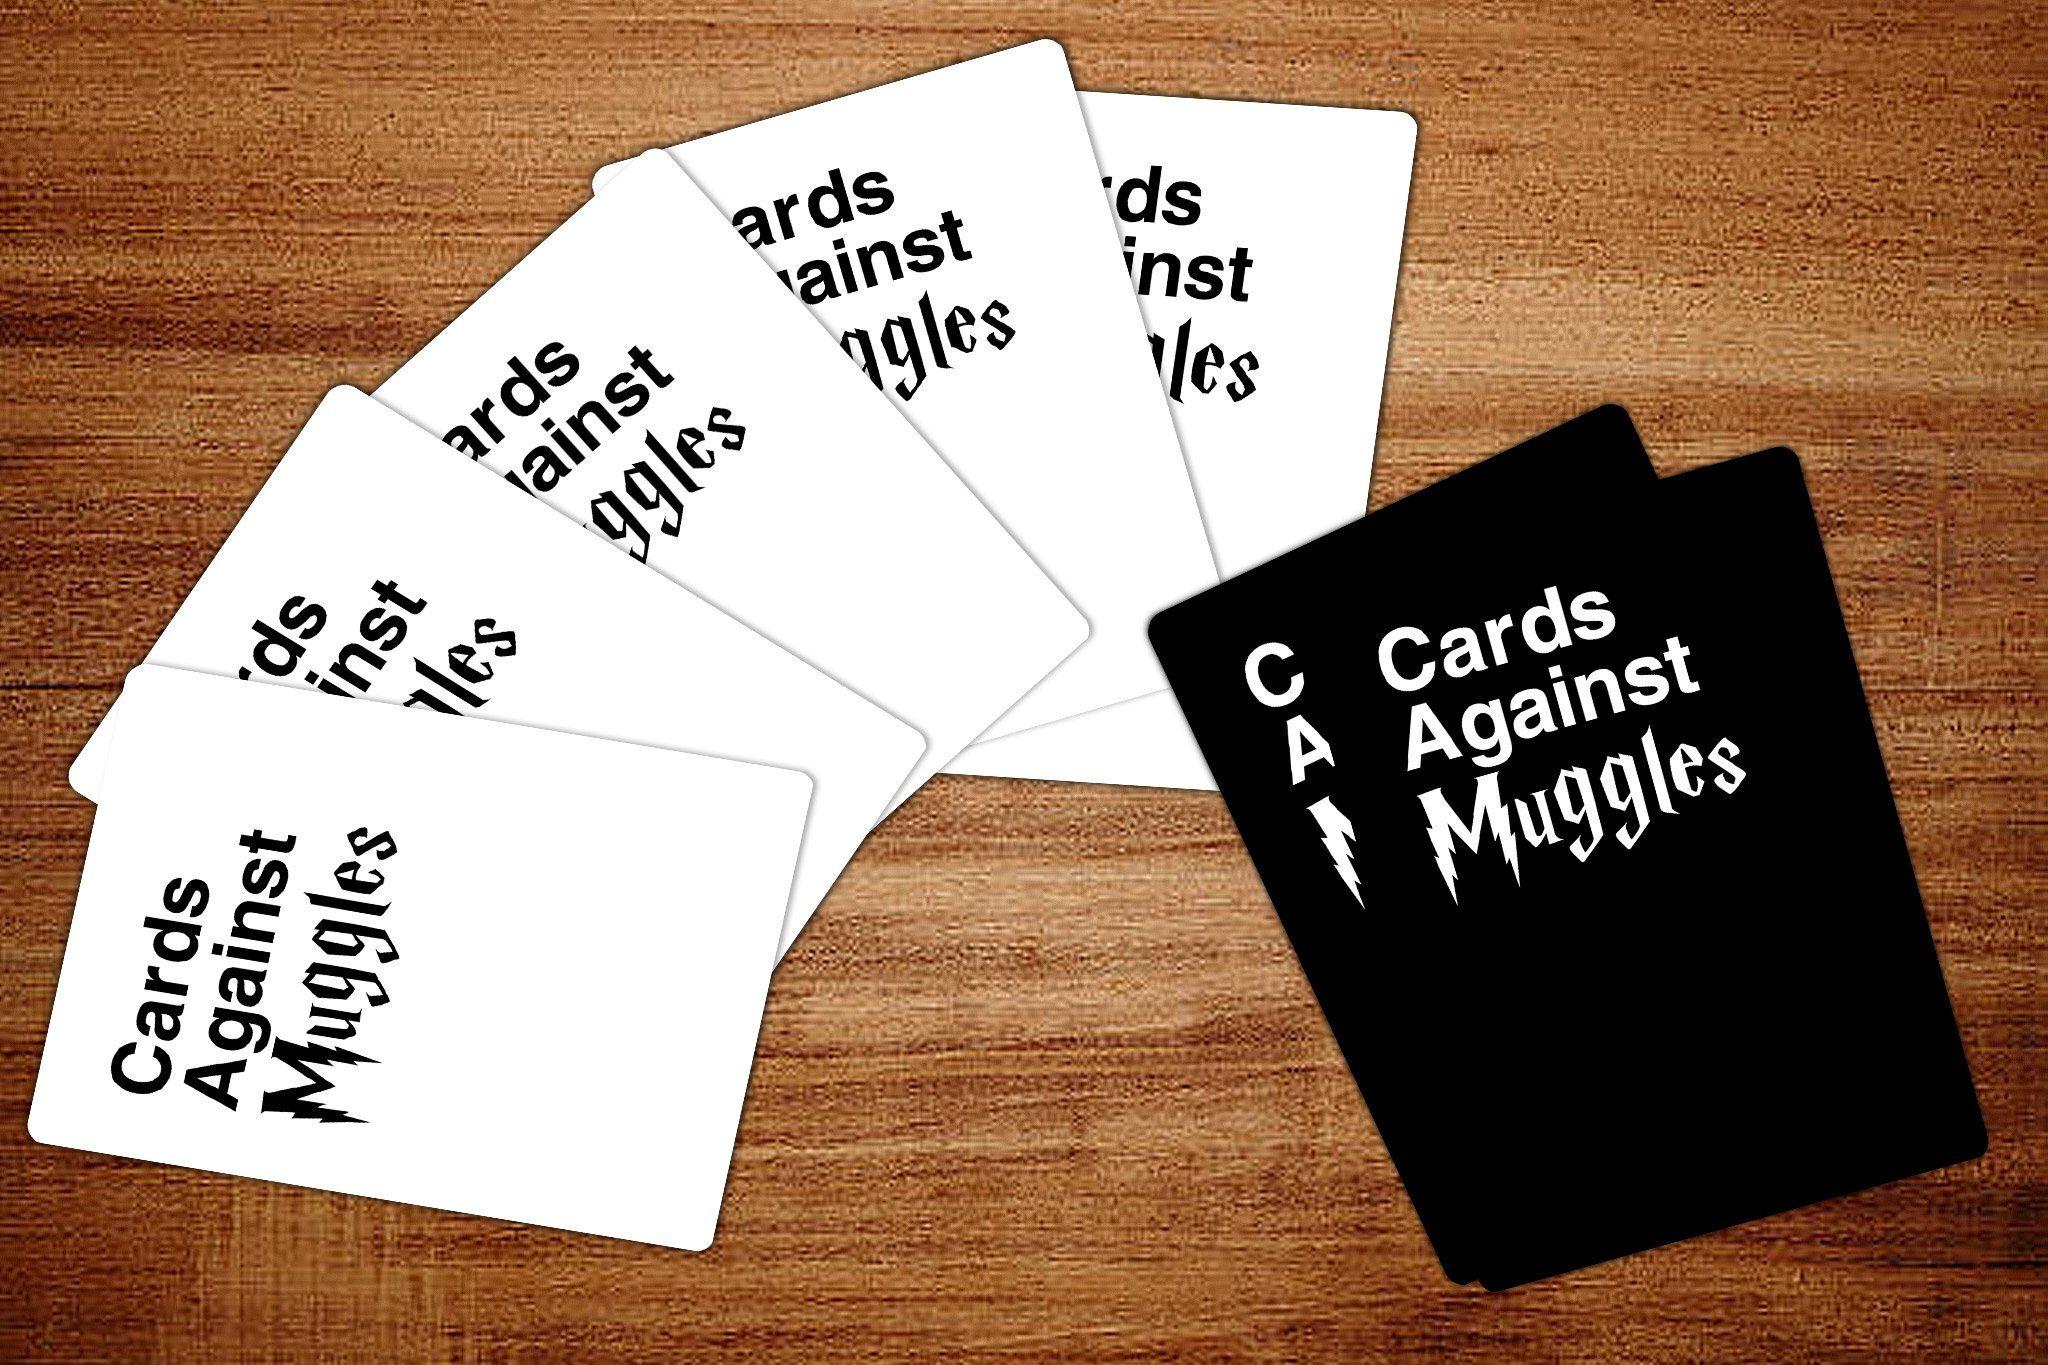 Cards against muggles digital download humanity hates